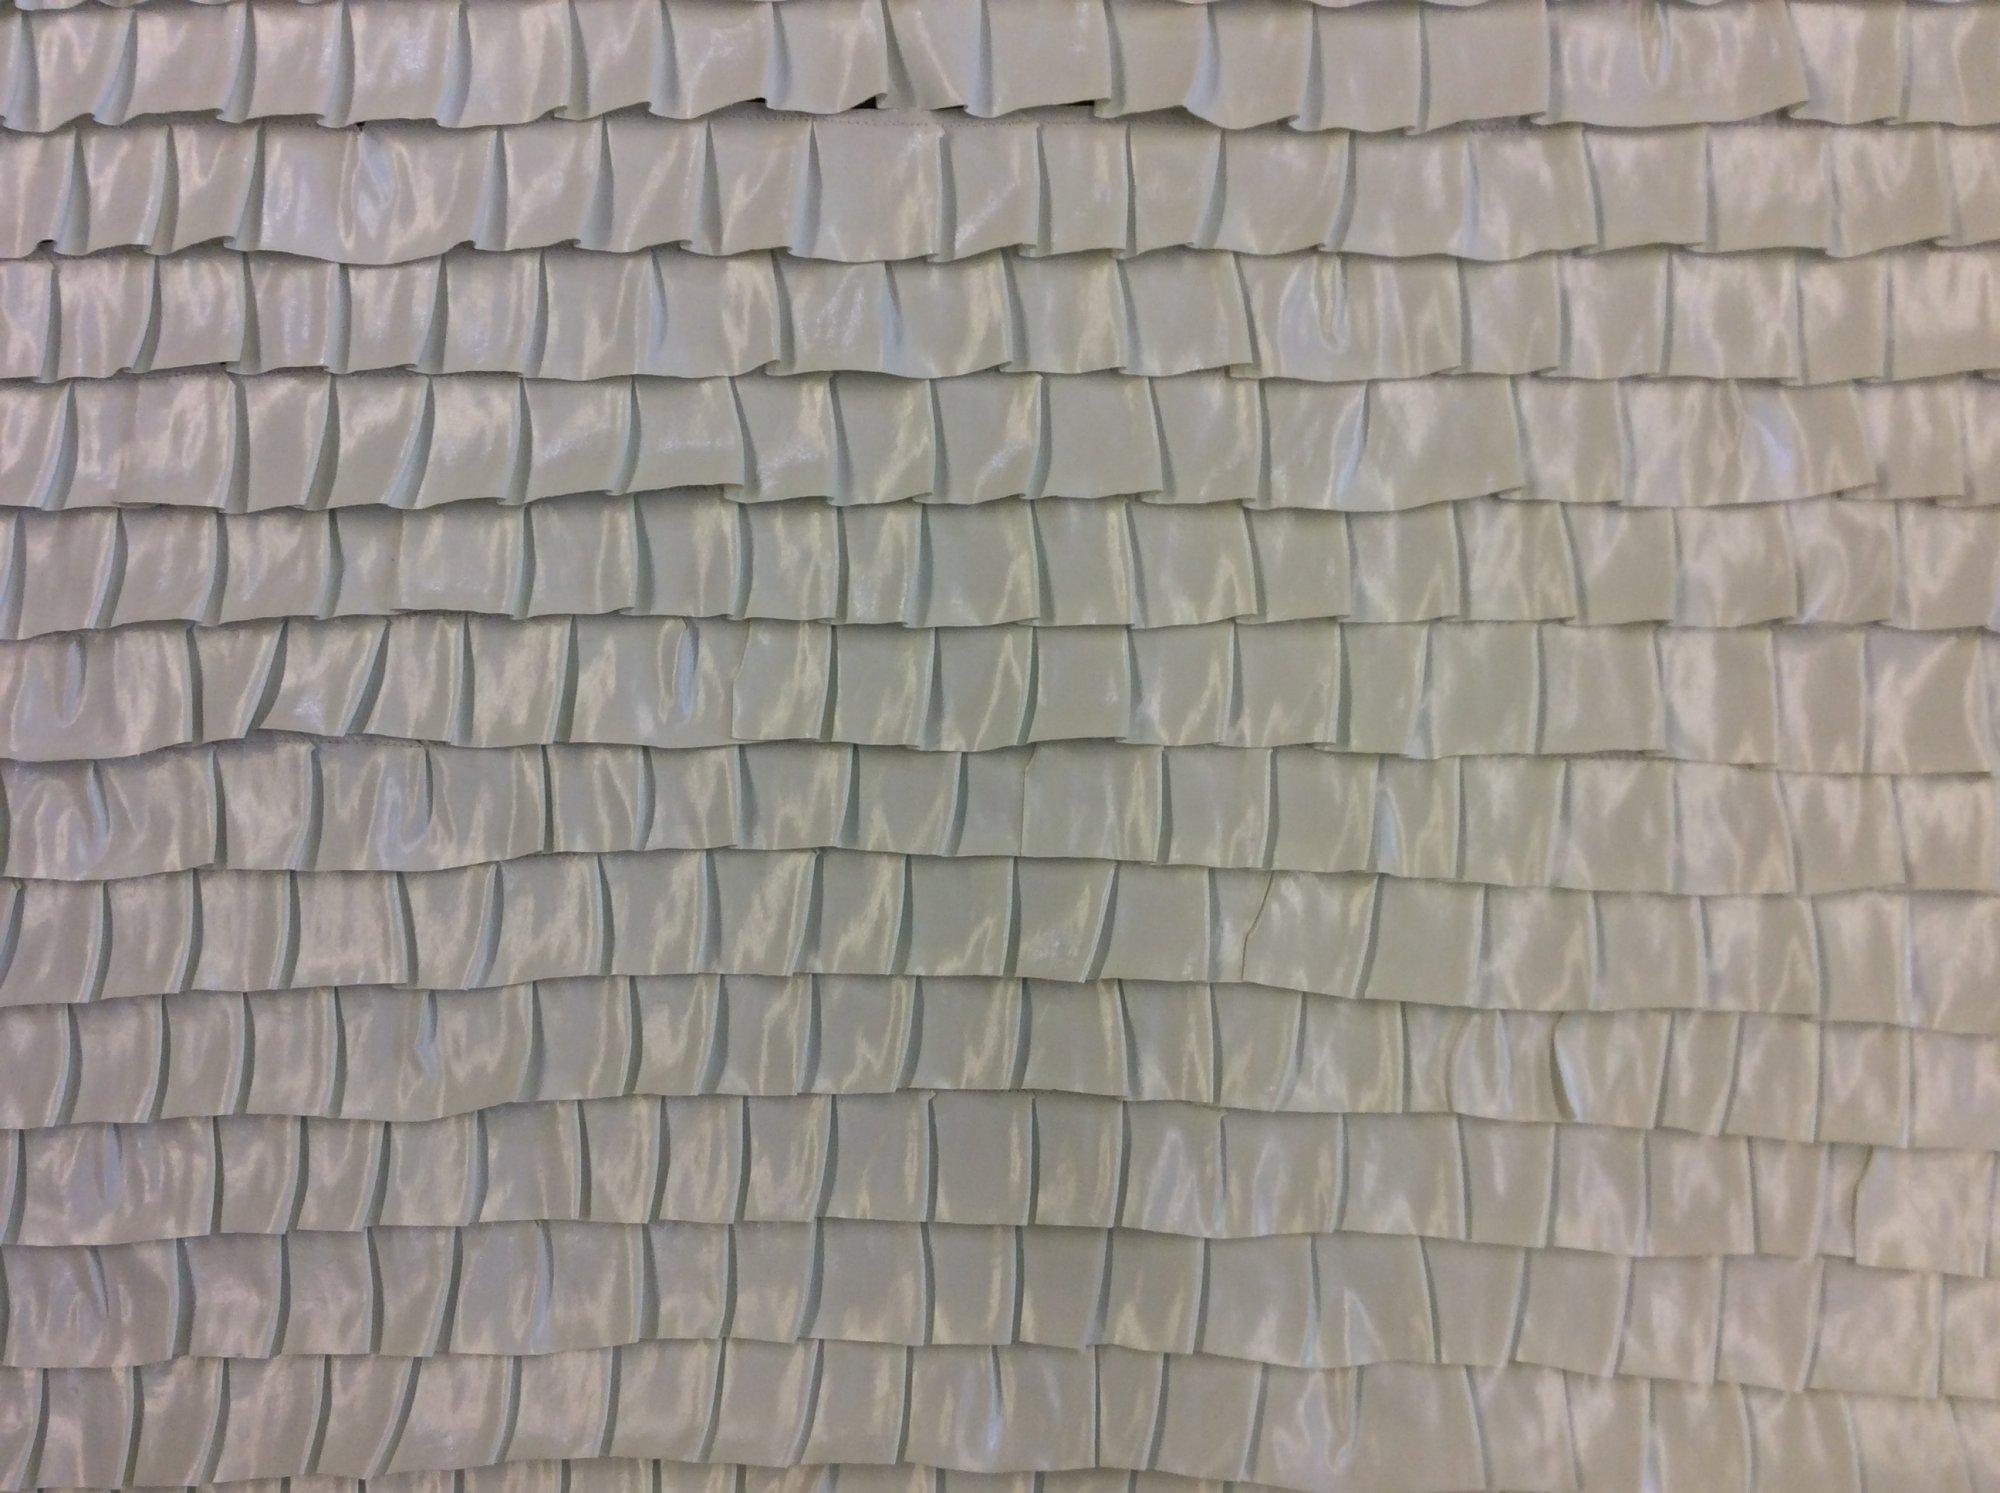 Ruffled Cream Vinyl Made in Japan Apparel Sewing Fabric RA3329